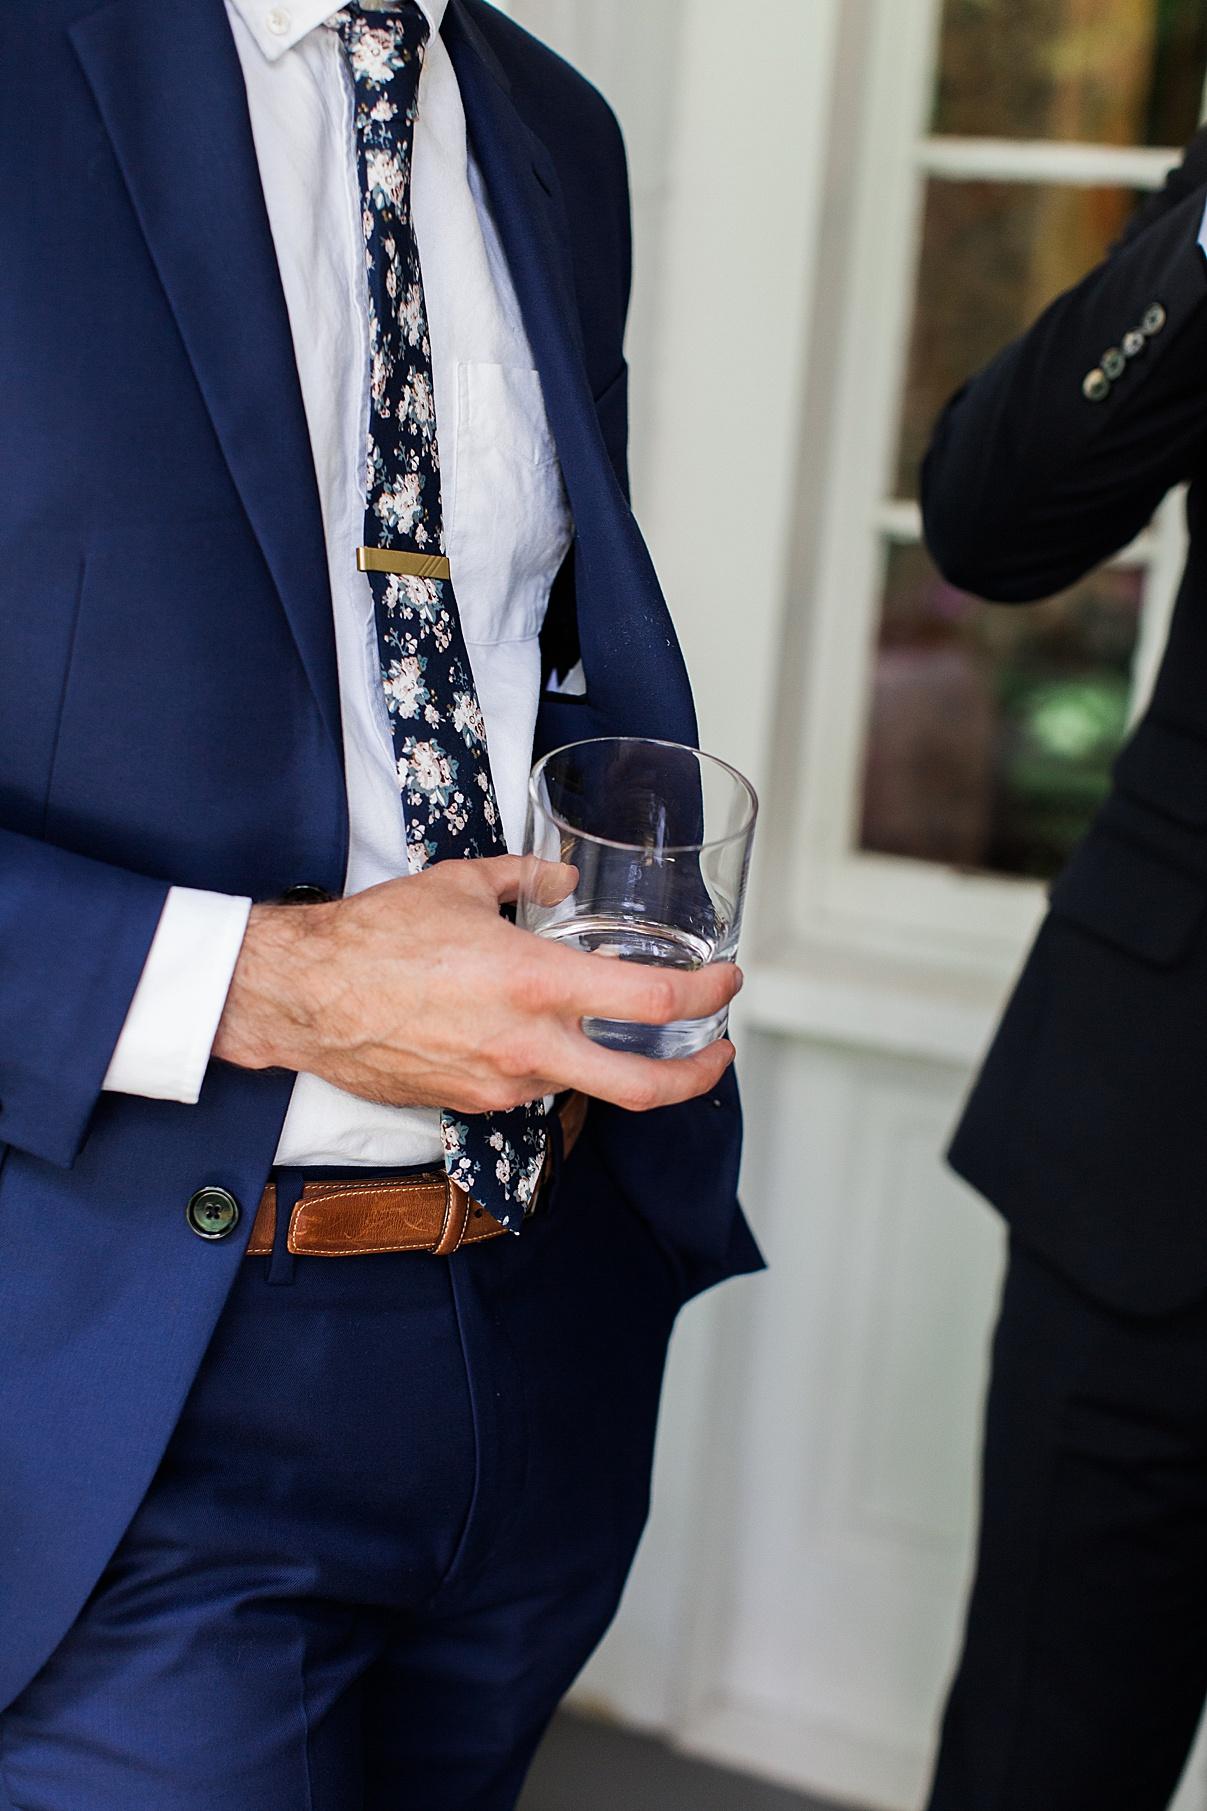 Groom holding whiskey glass | Balls Falls, Ontario Wedding| Ontario Wedding Photographer| Toronto Wedding Photographer| 3Photography|3photography.ca